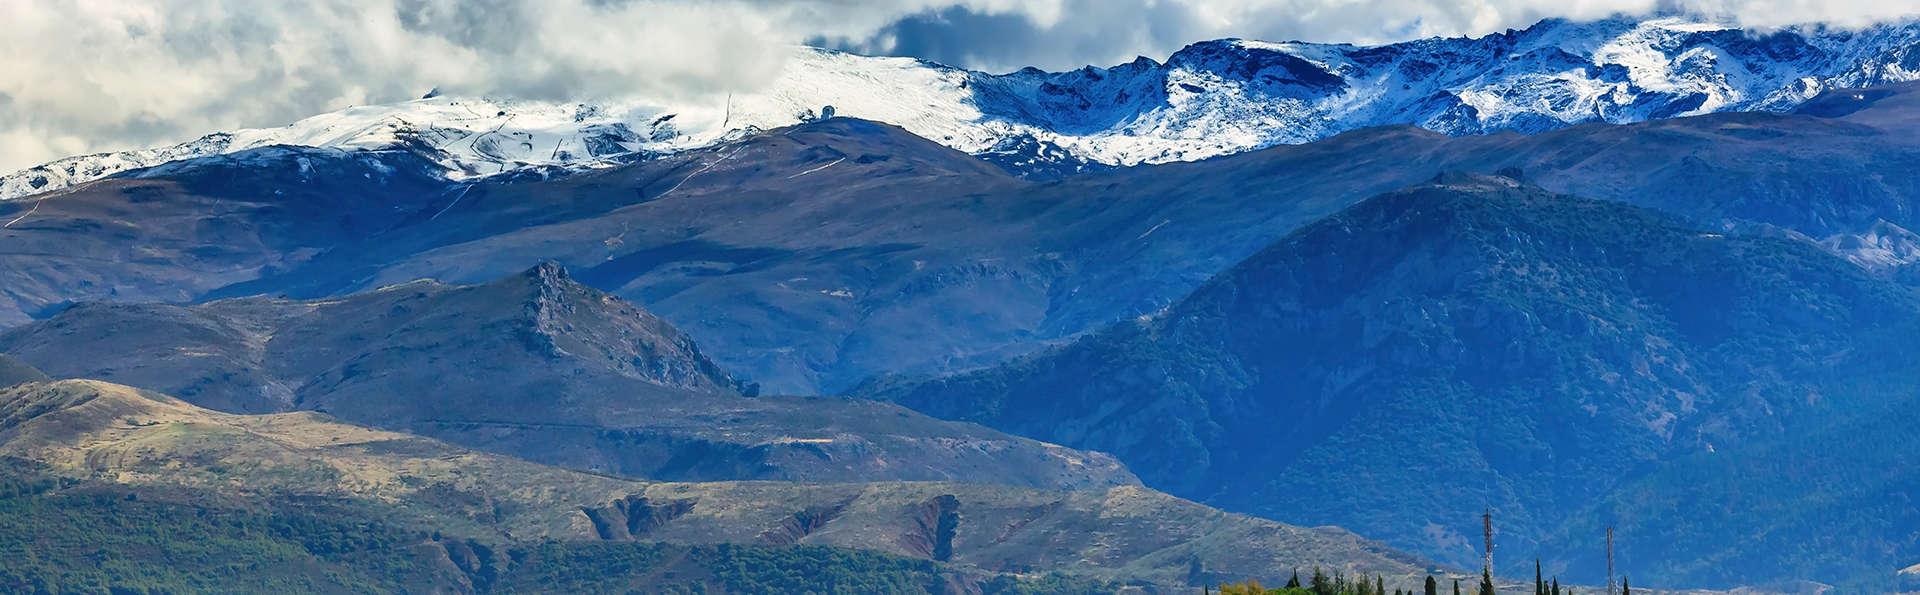 Week-end romantique à la Sierra Nevada